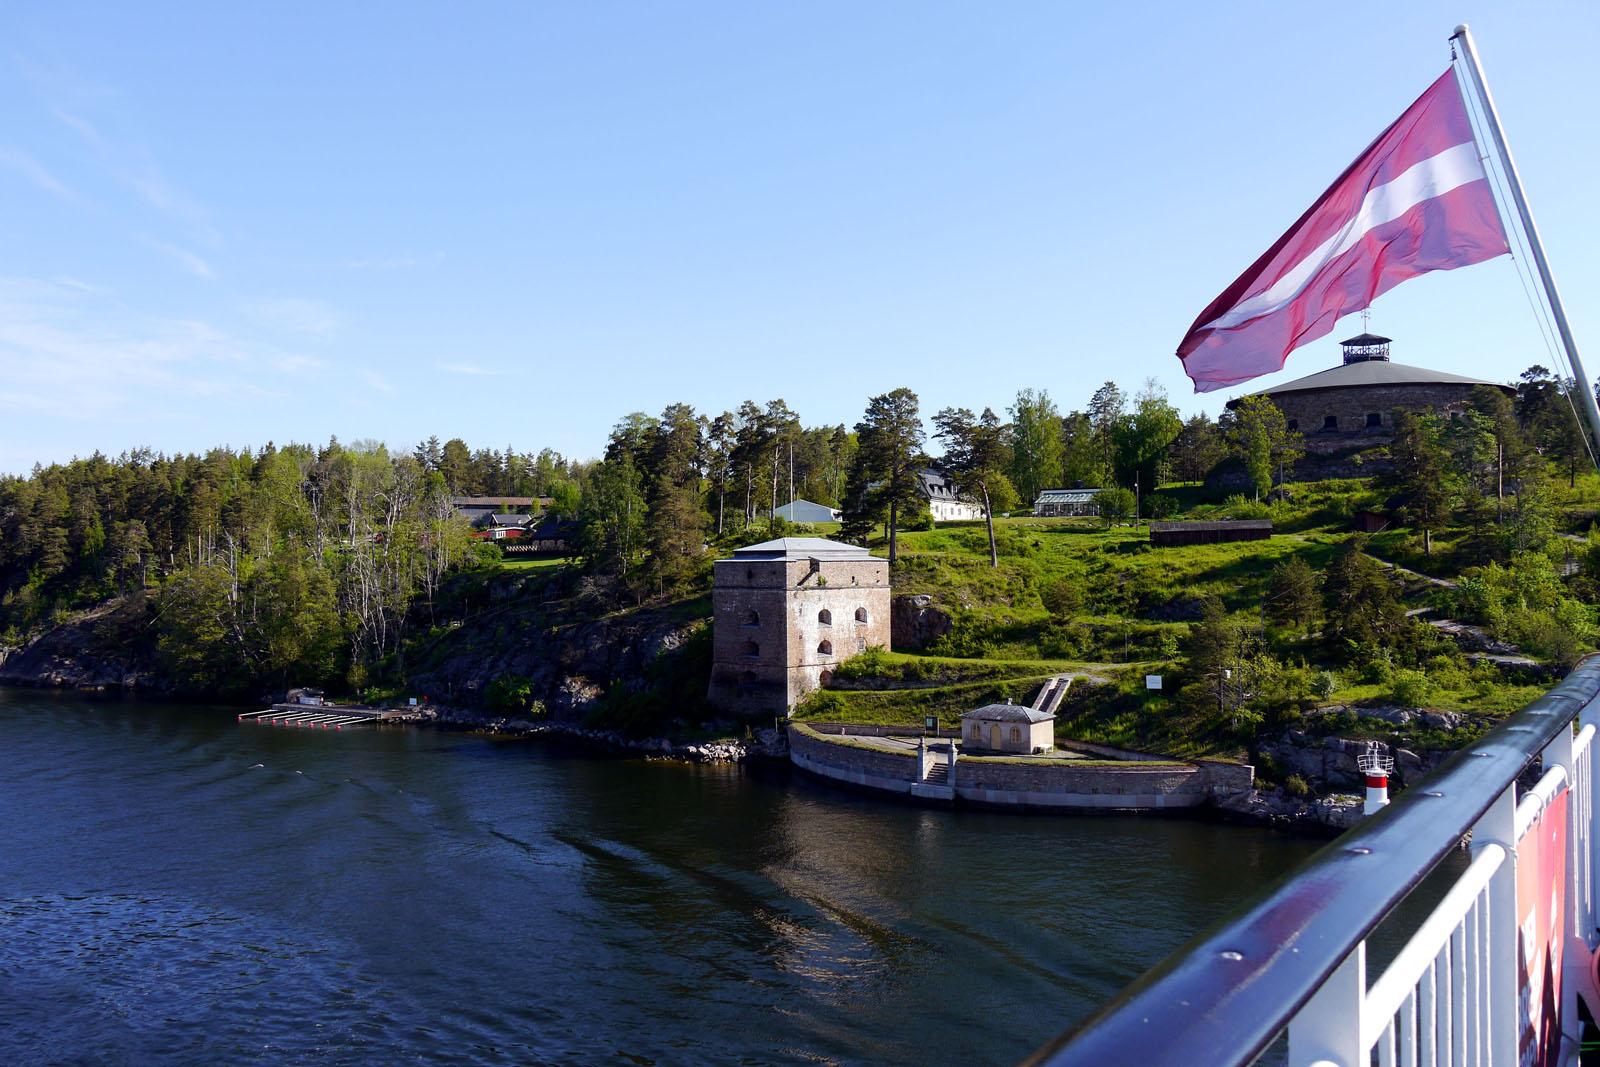 Riga-Stockholm-Isabelle-Stockholmer Schaerengarten